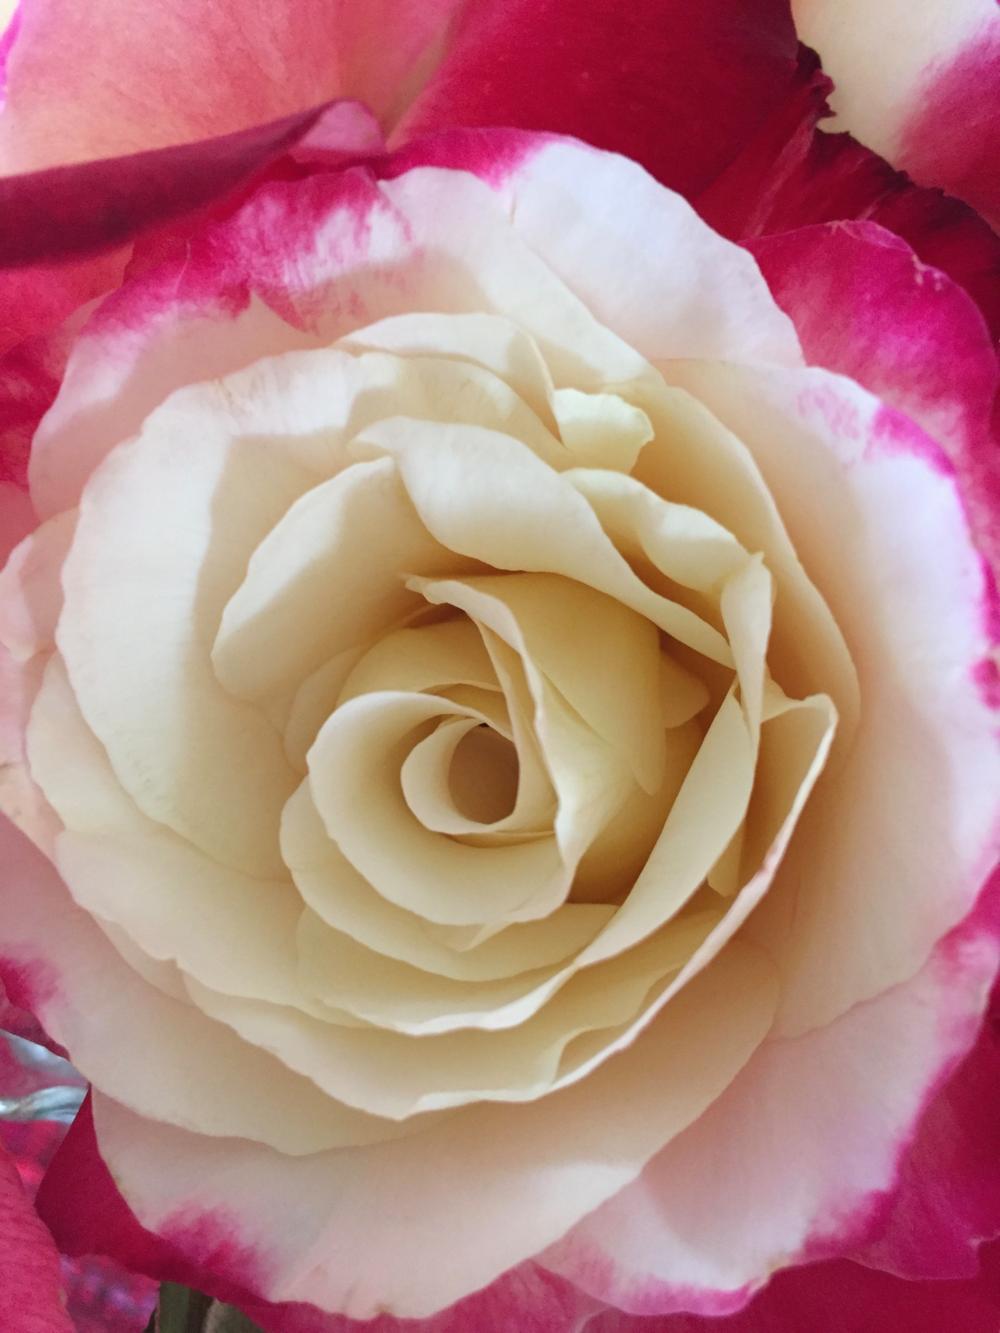 Flower-4-Poster_printfile_default_18x24.png